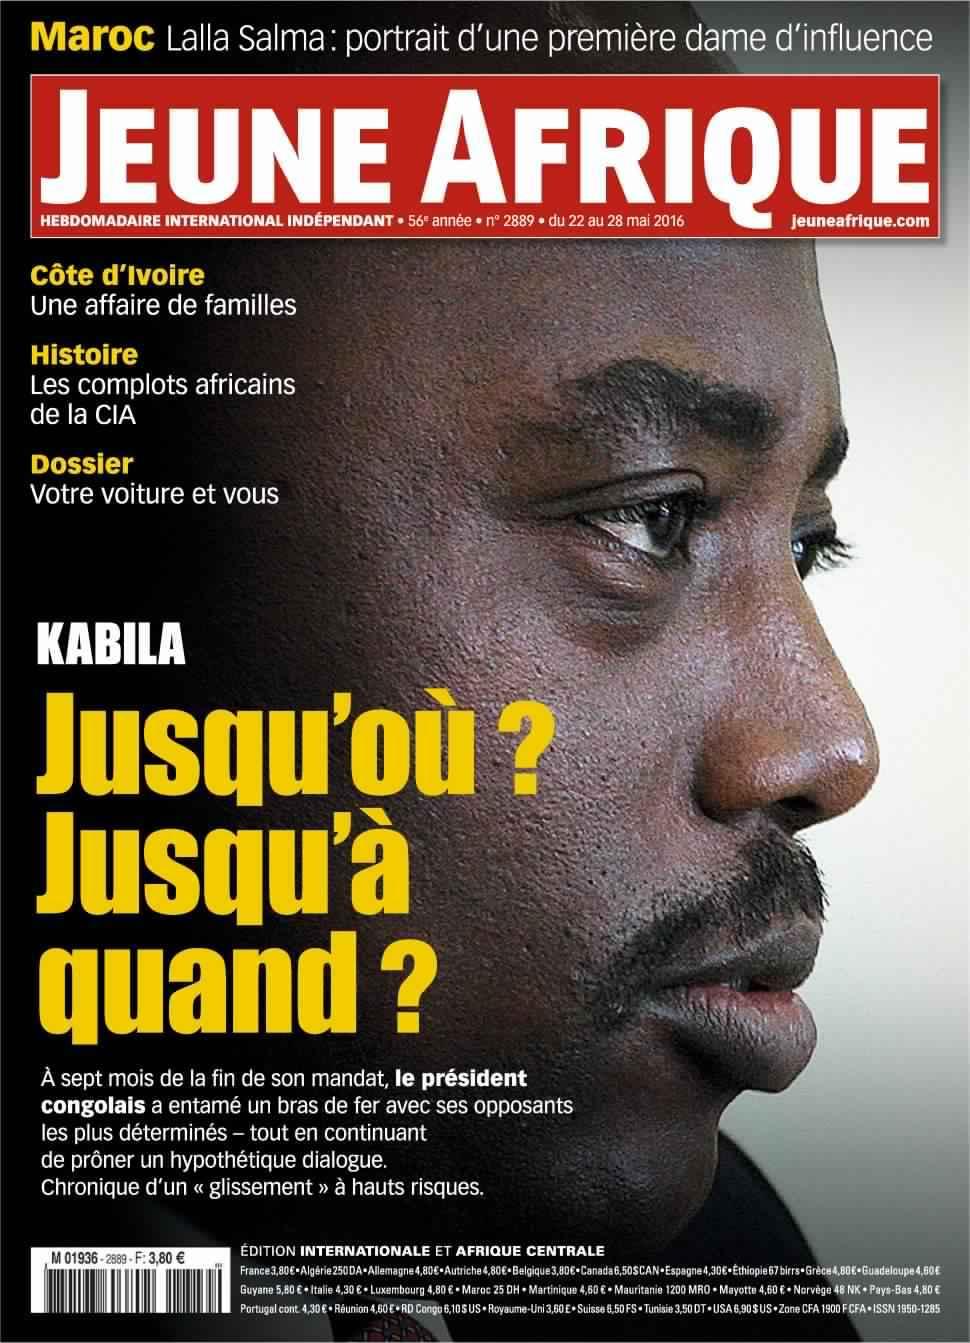 Jeune Afrique 2888 - 22 Mai 2016